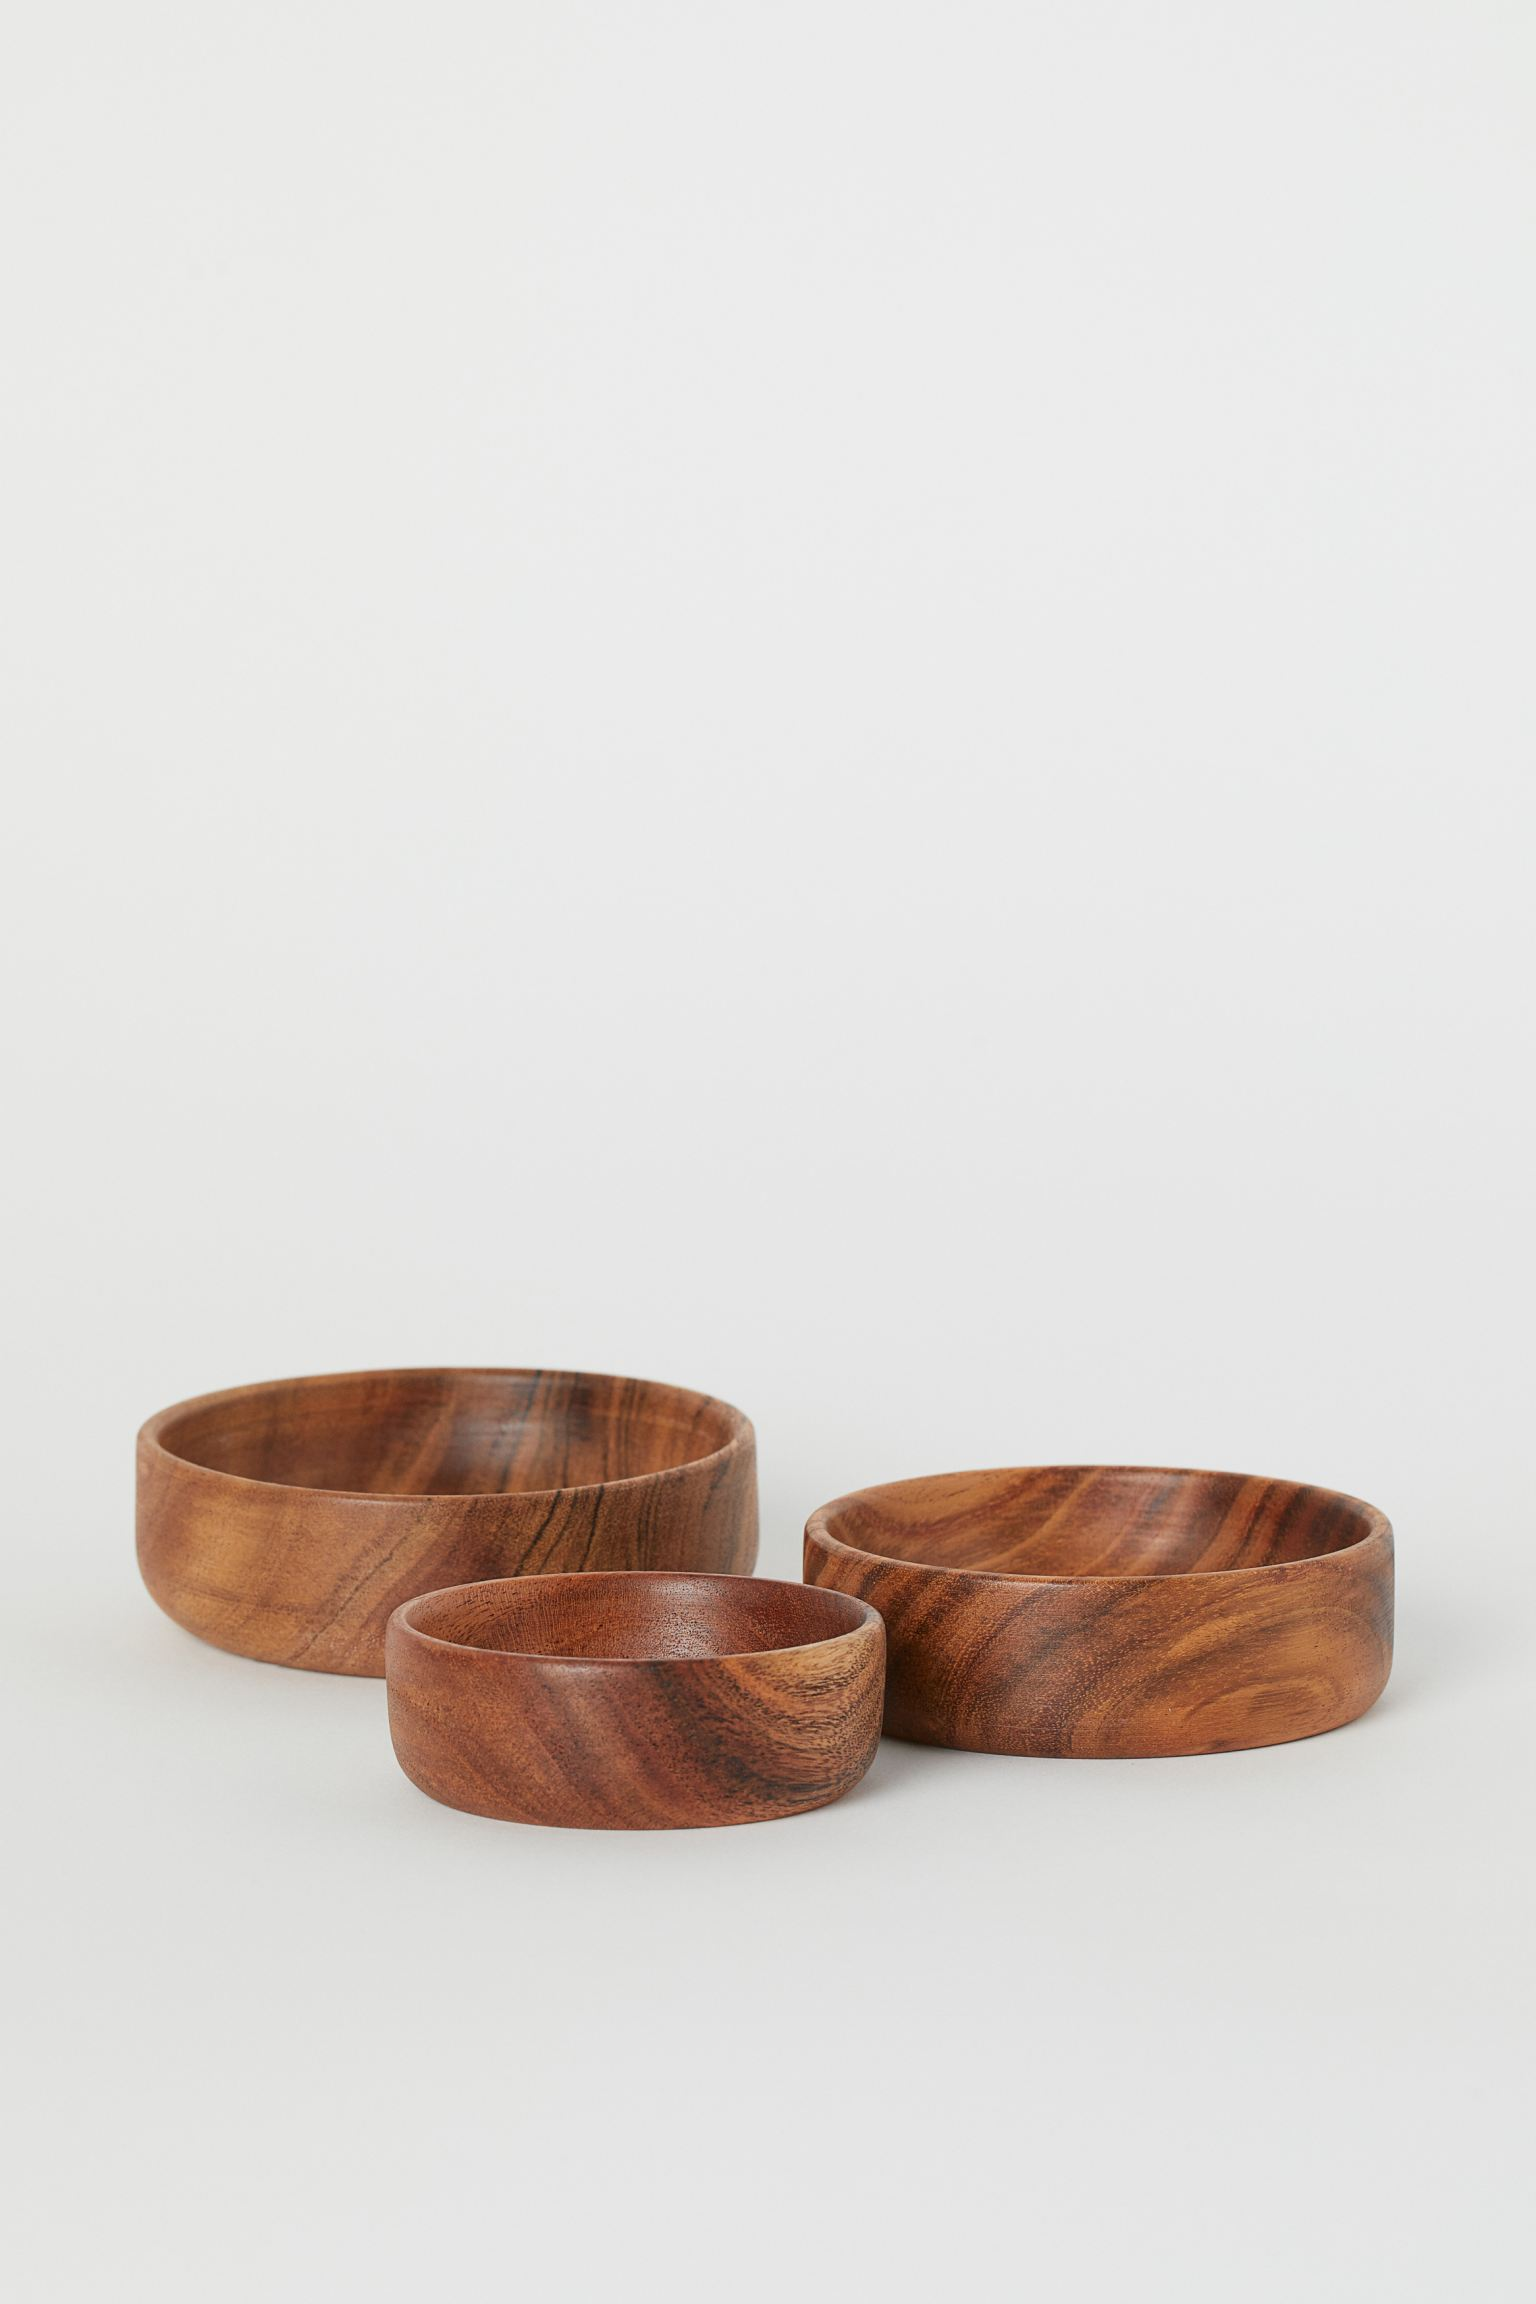 HM 3 wood bowls